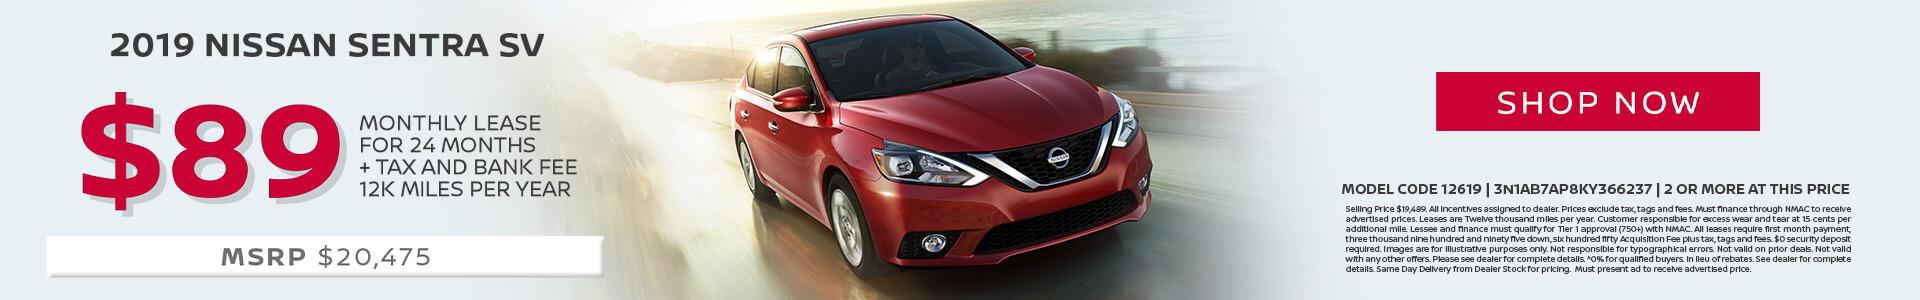 Nissan Sentra $89 Lease